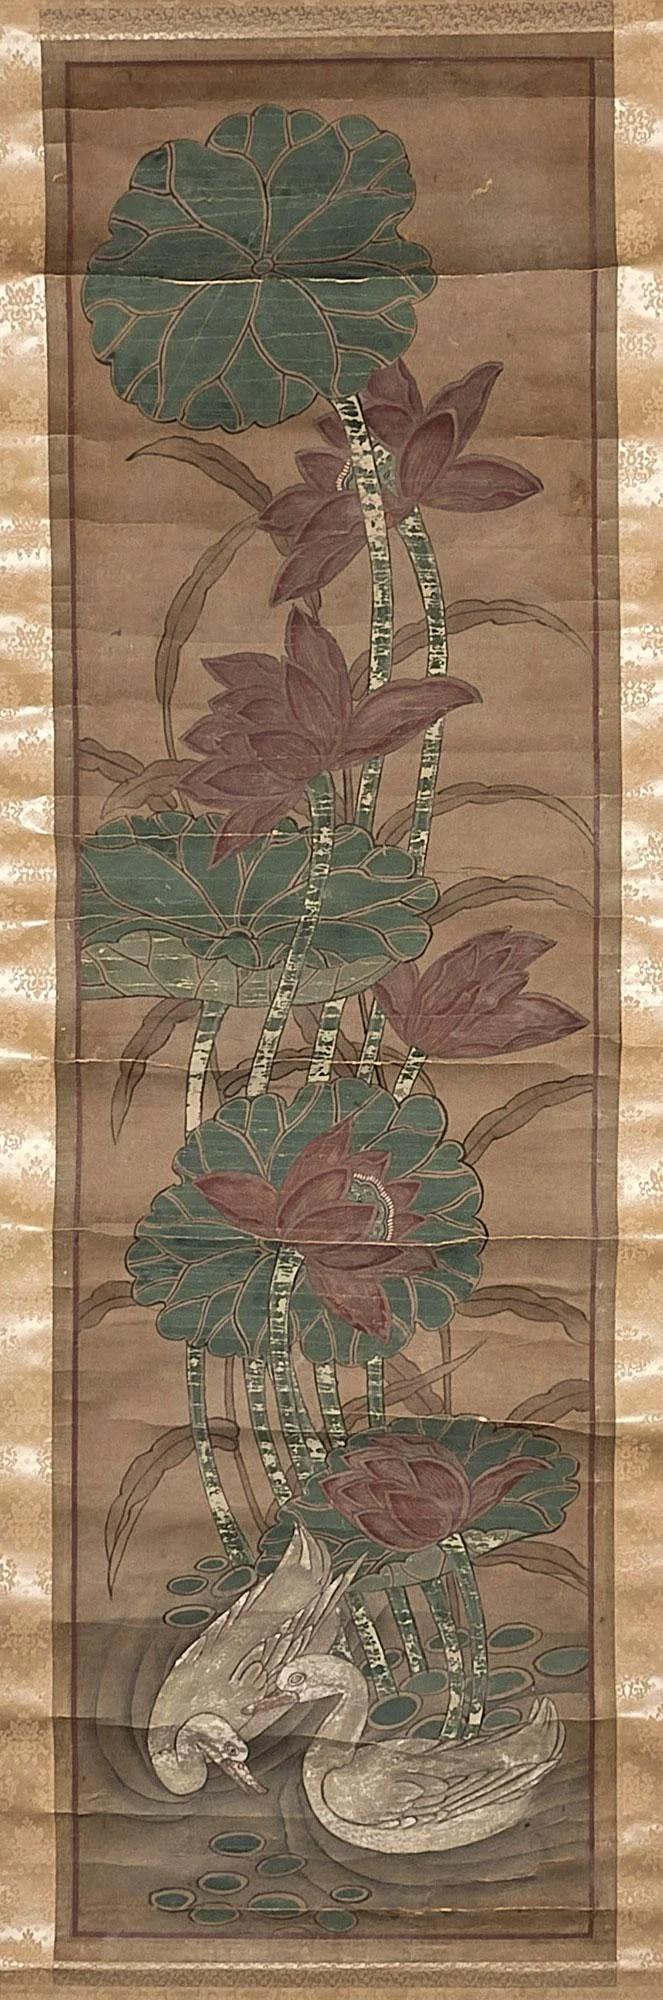 19th Century Korean Scroll Painting